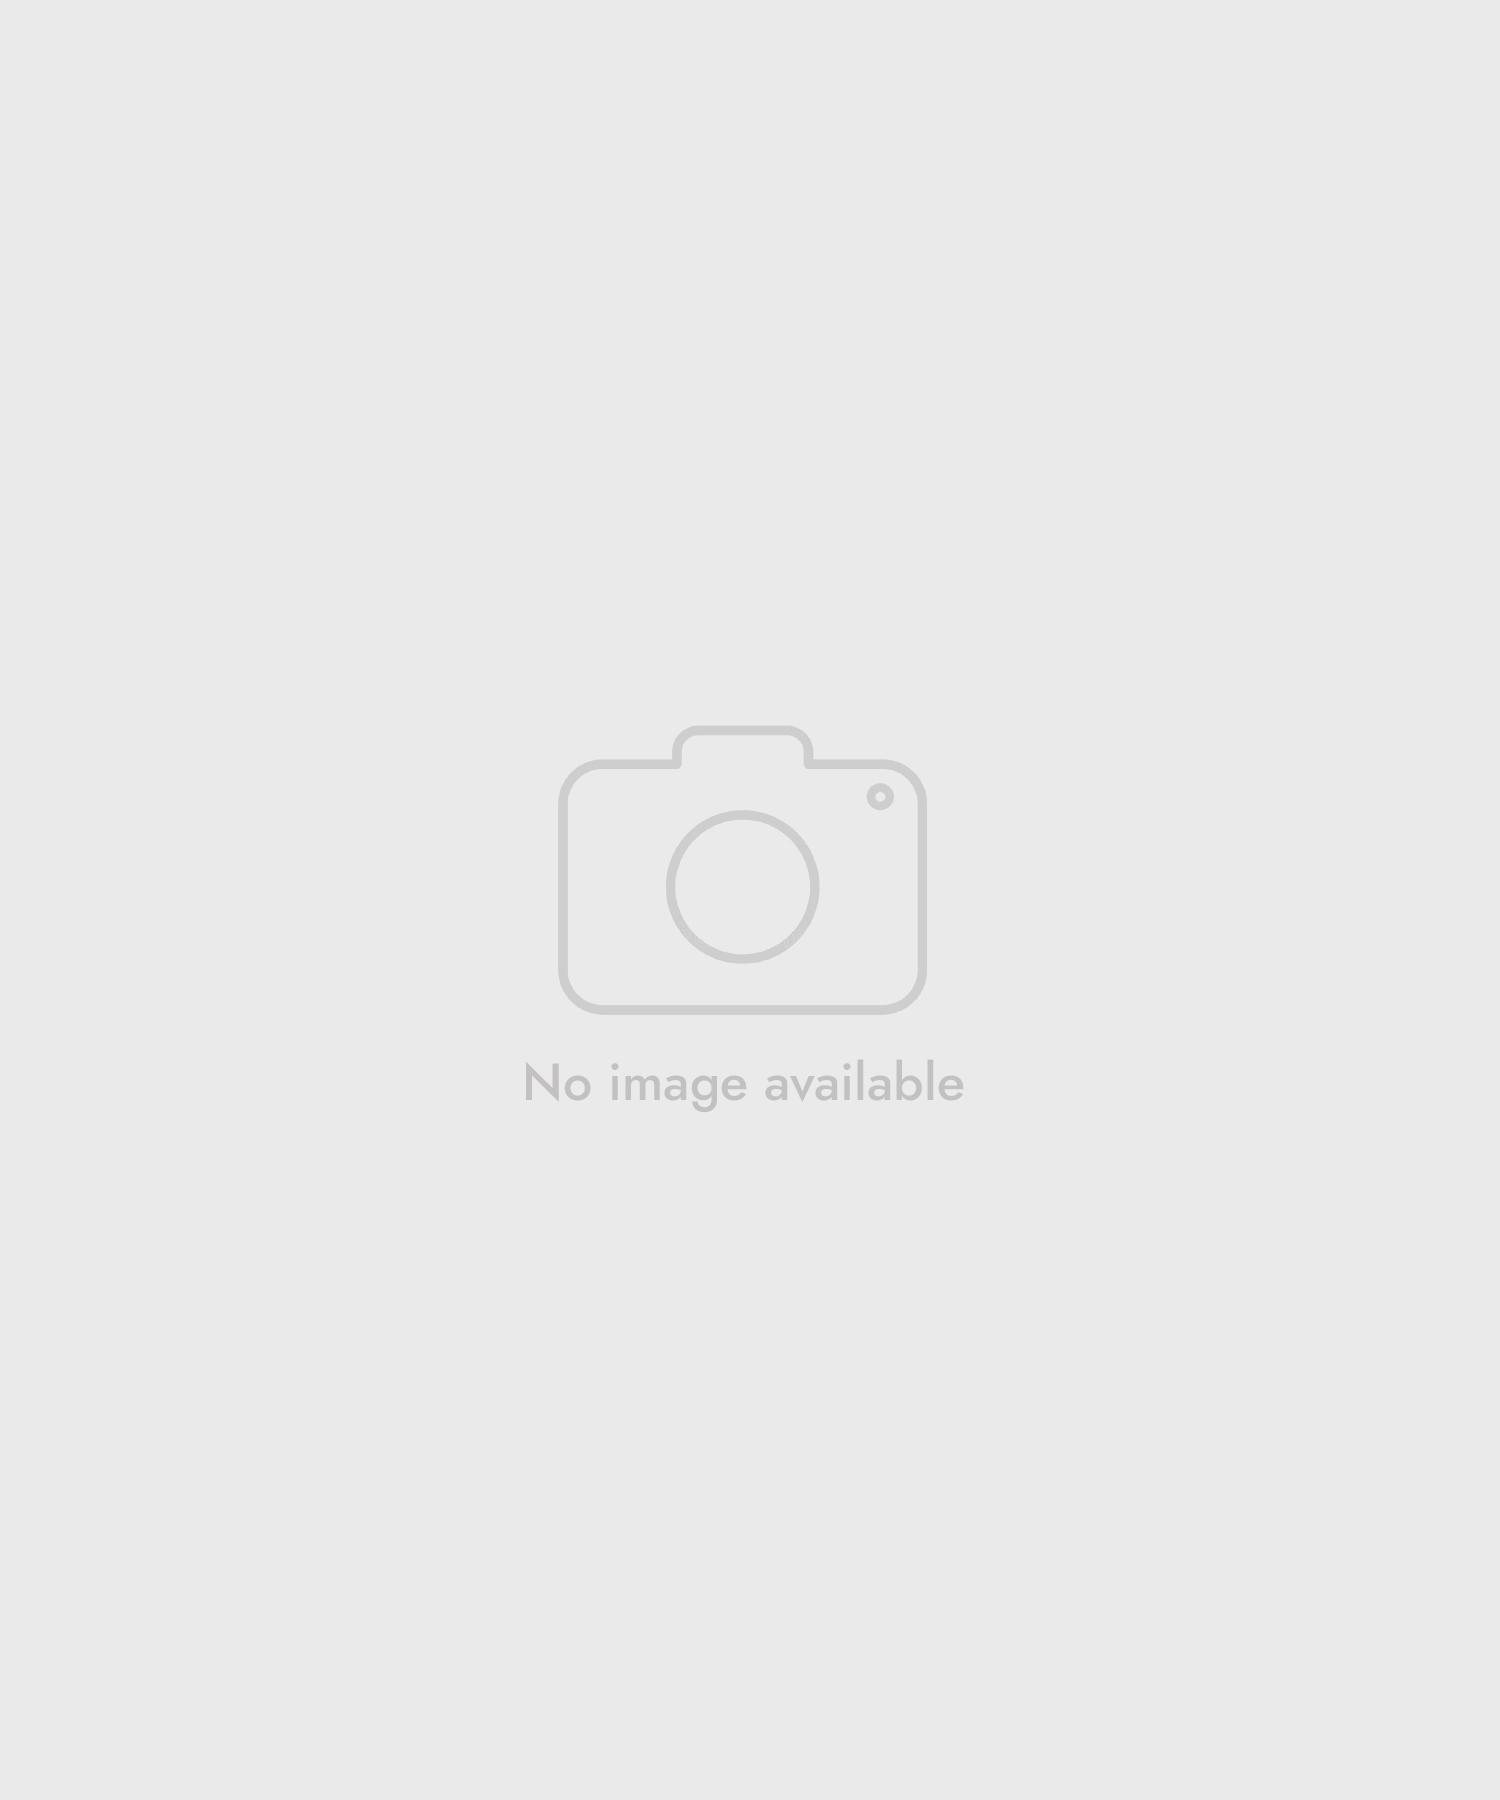 Srebrne skórzane czółenka damskie